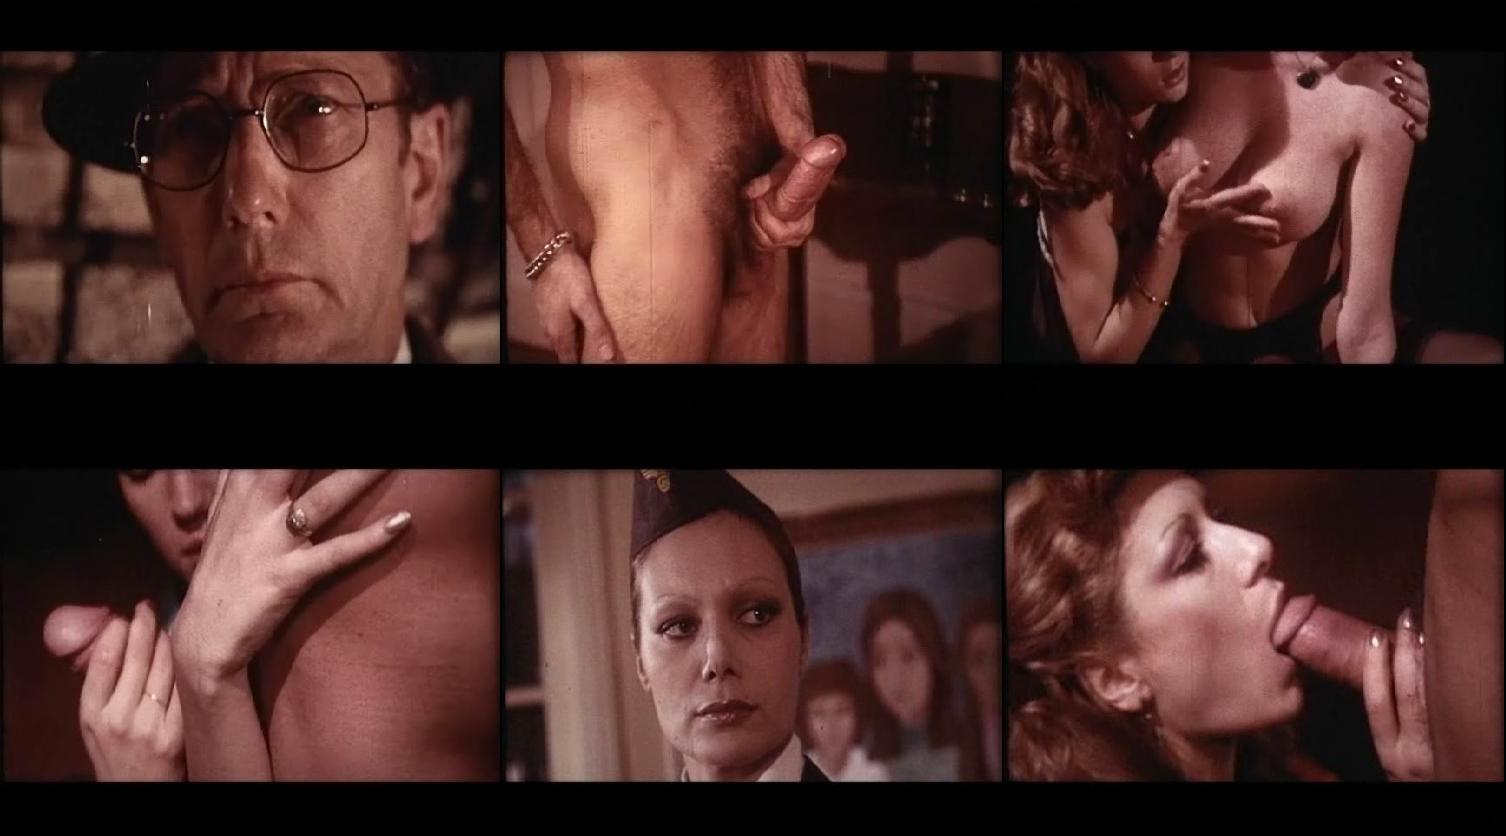 porno-porno-retro-dom-terpimosti-chlene-foto